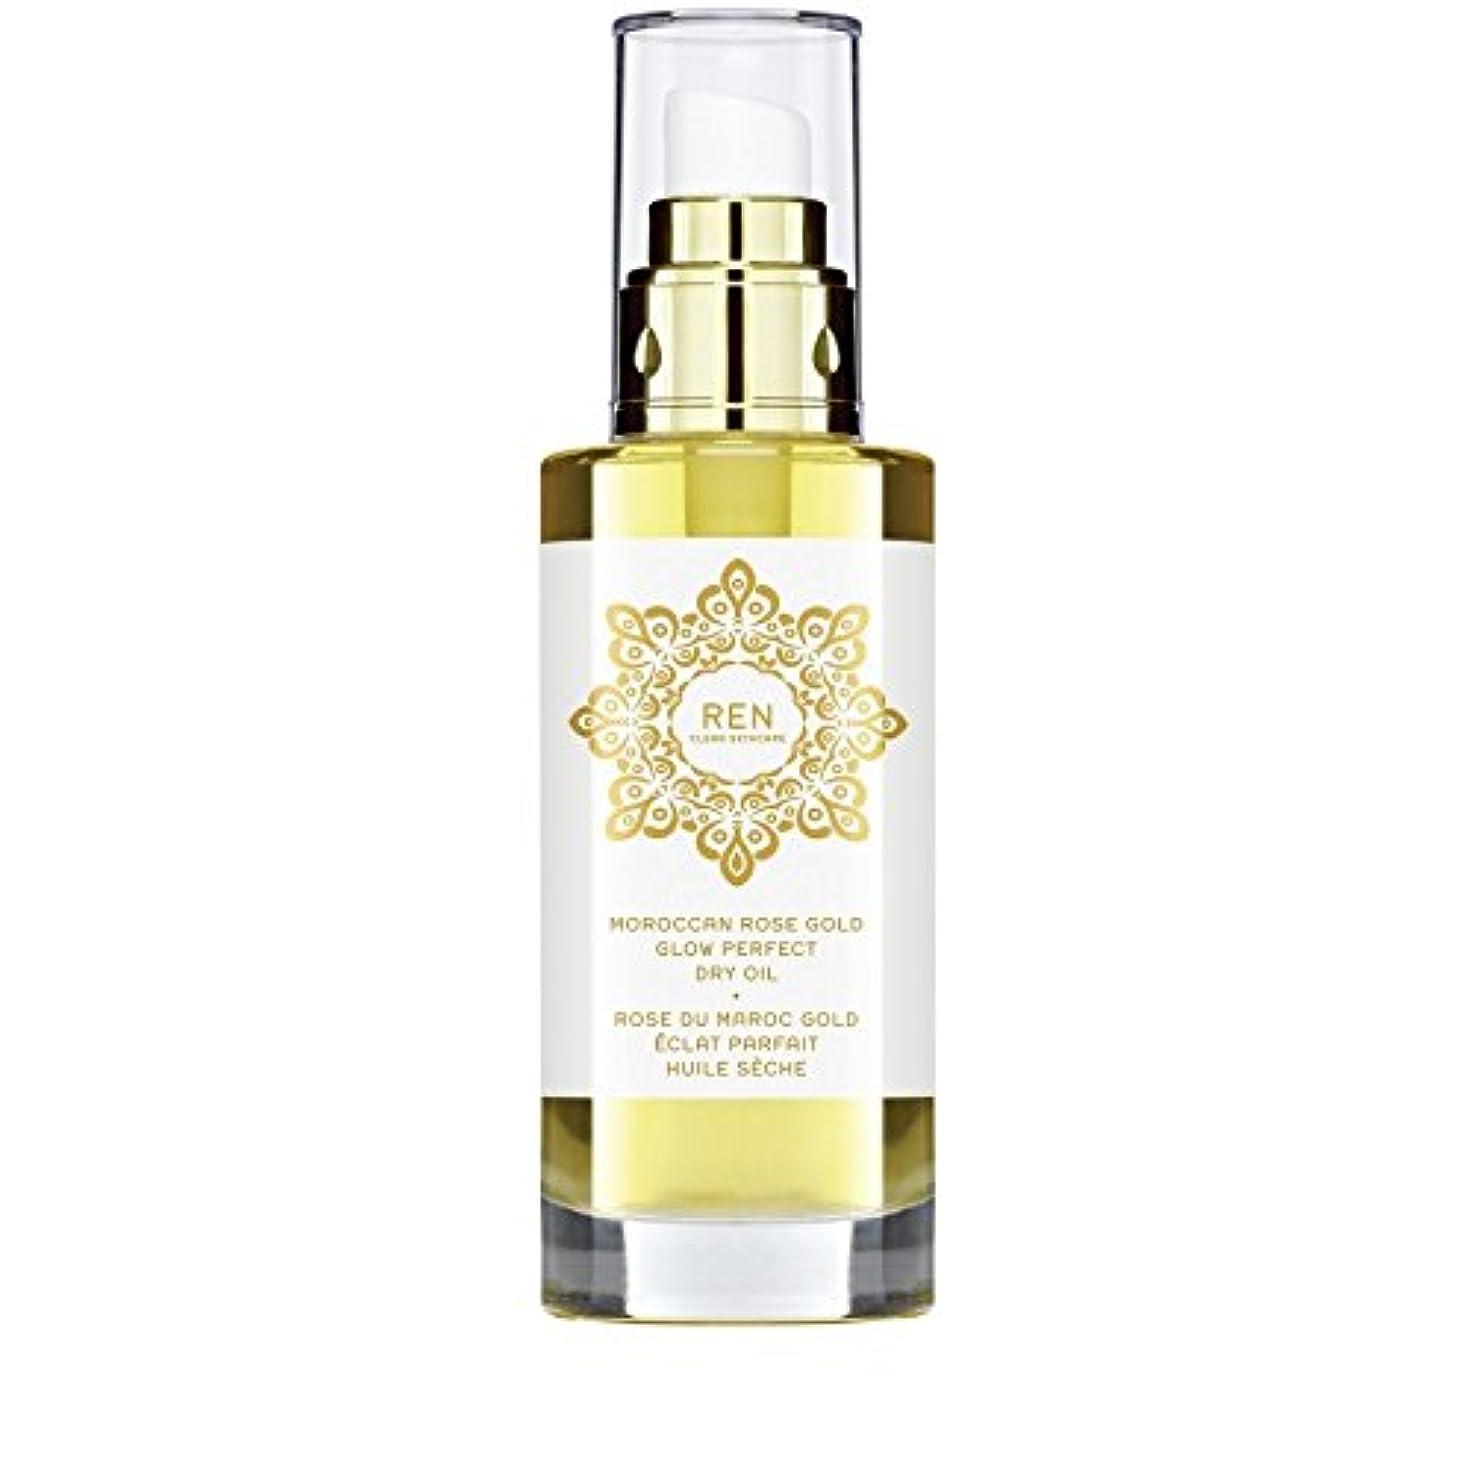 REN Moroccan Rose Gold Glow Perfect Dry Oil 100ml - モロッコは金が完璧なドライオイル100ミリリットルグローバラ [並行輸入品]